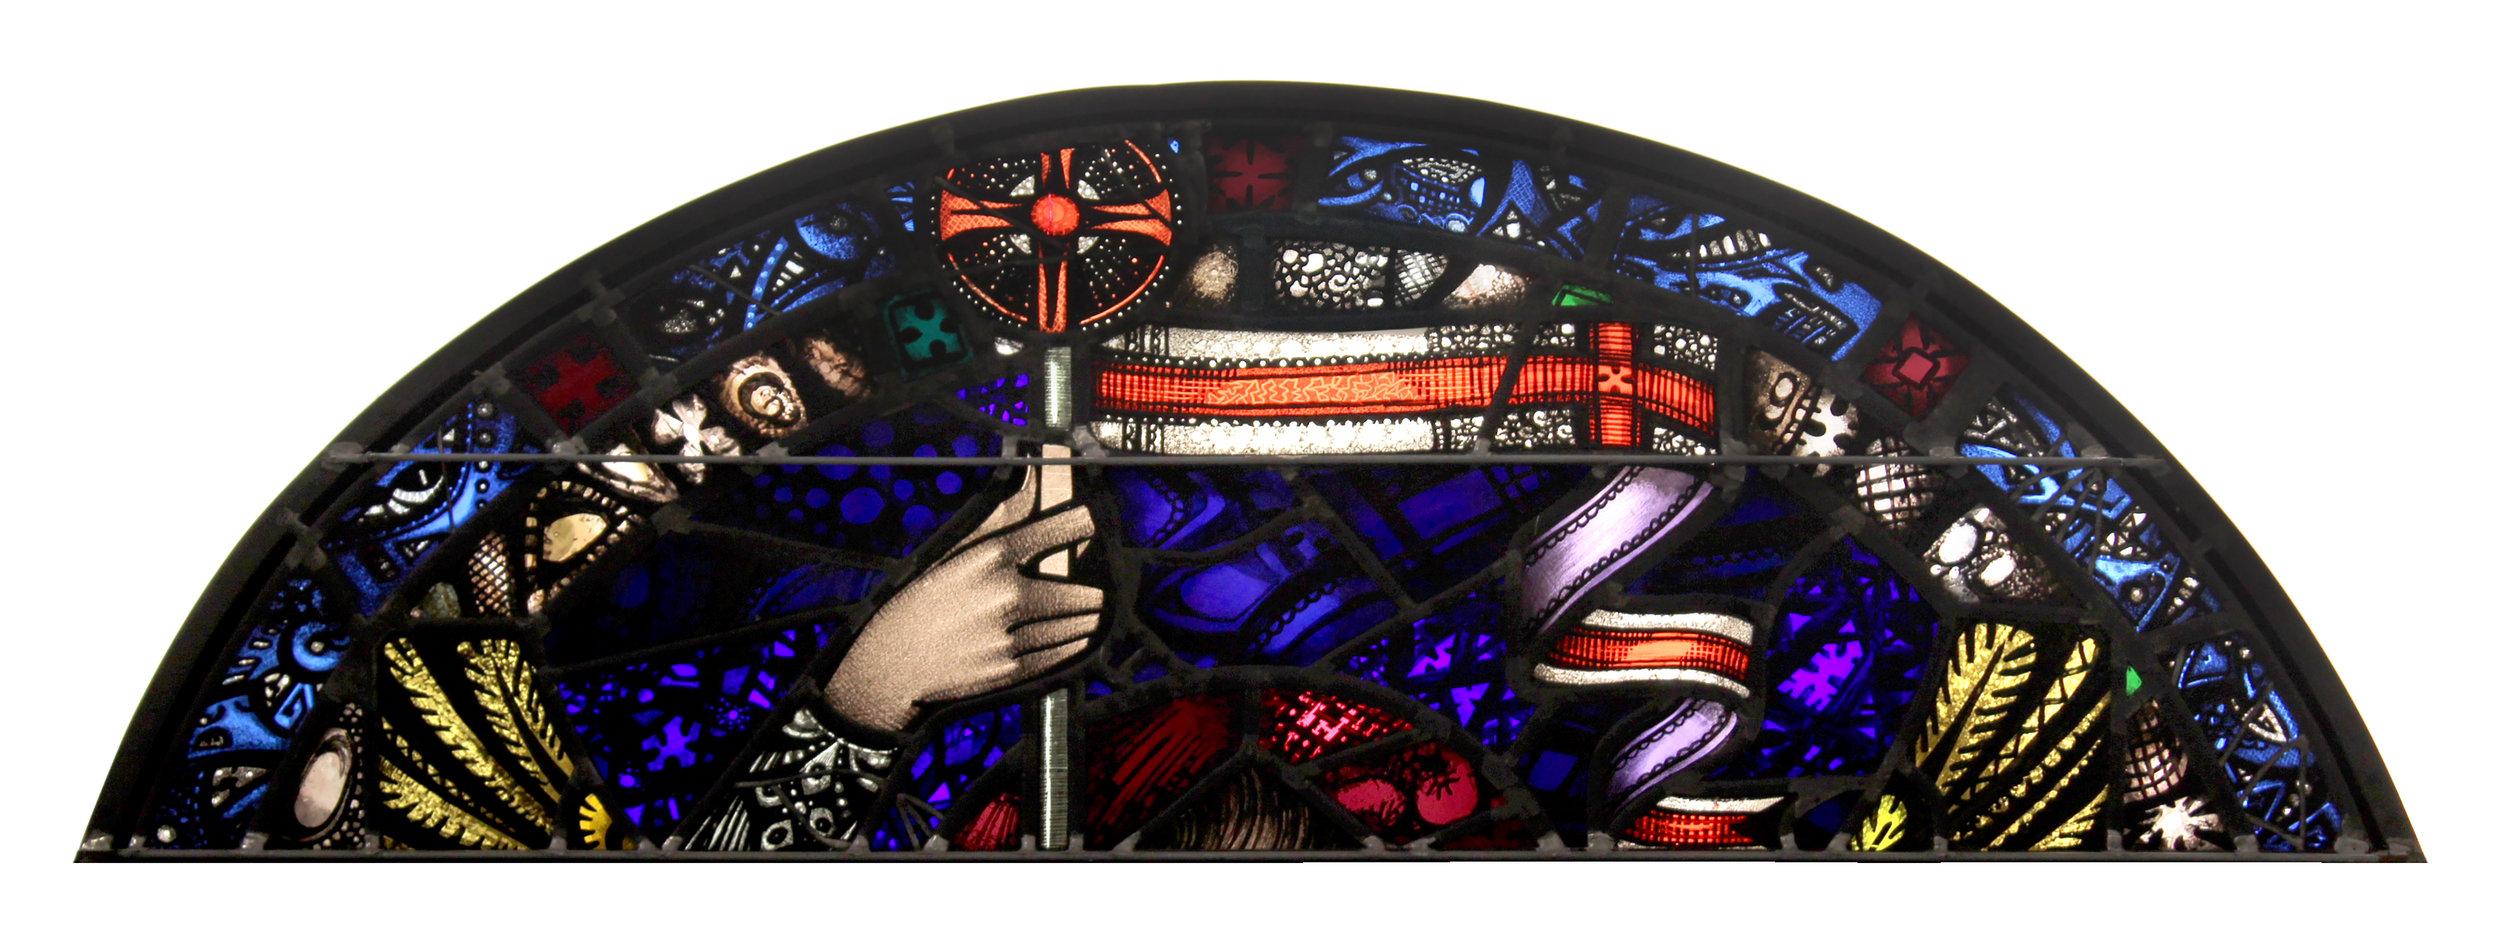 Copy of After Restoration, Sacred Heart Church, Sacramento, CA